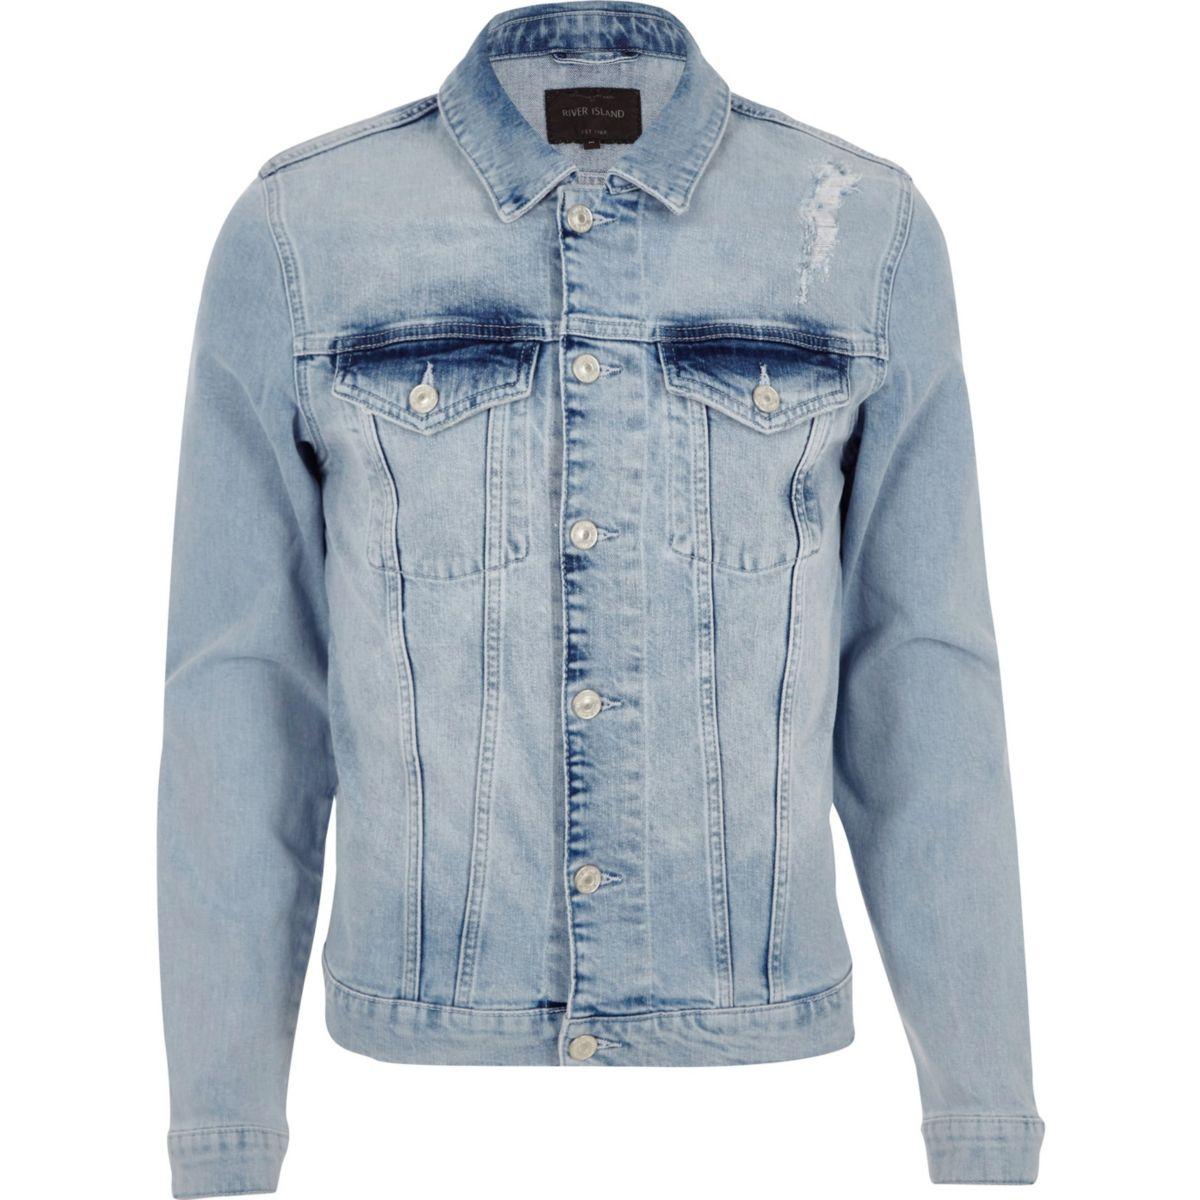 Blaue, schmale Jeansjacke im Used Look